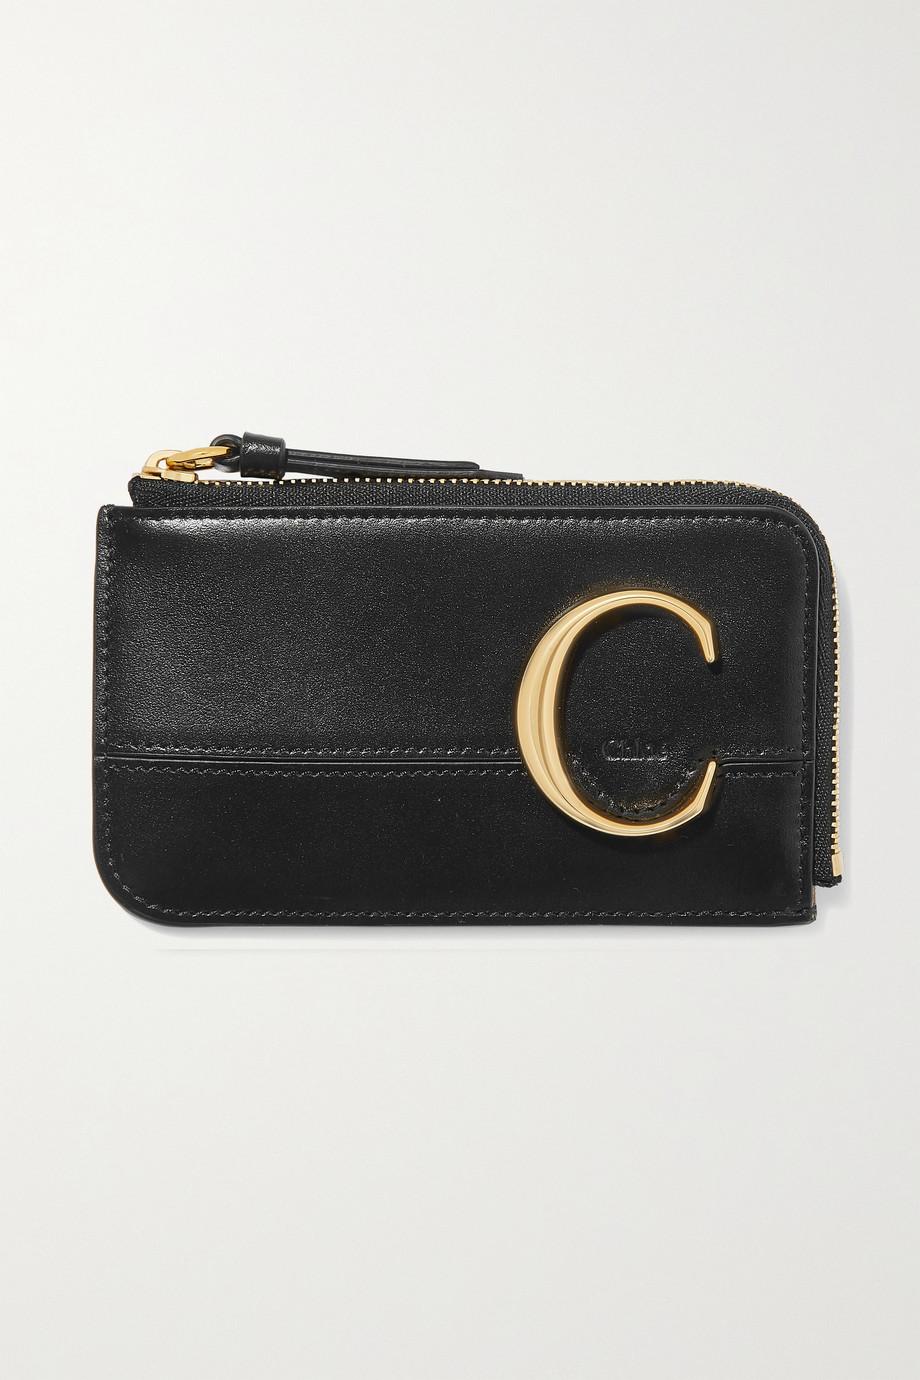 Chloé Porte-cartes en cuir Chloé C